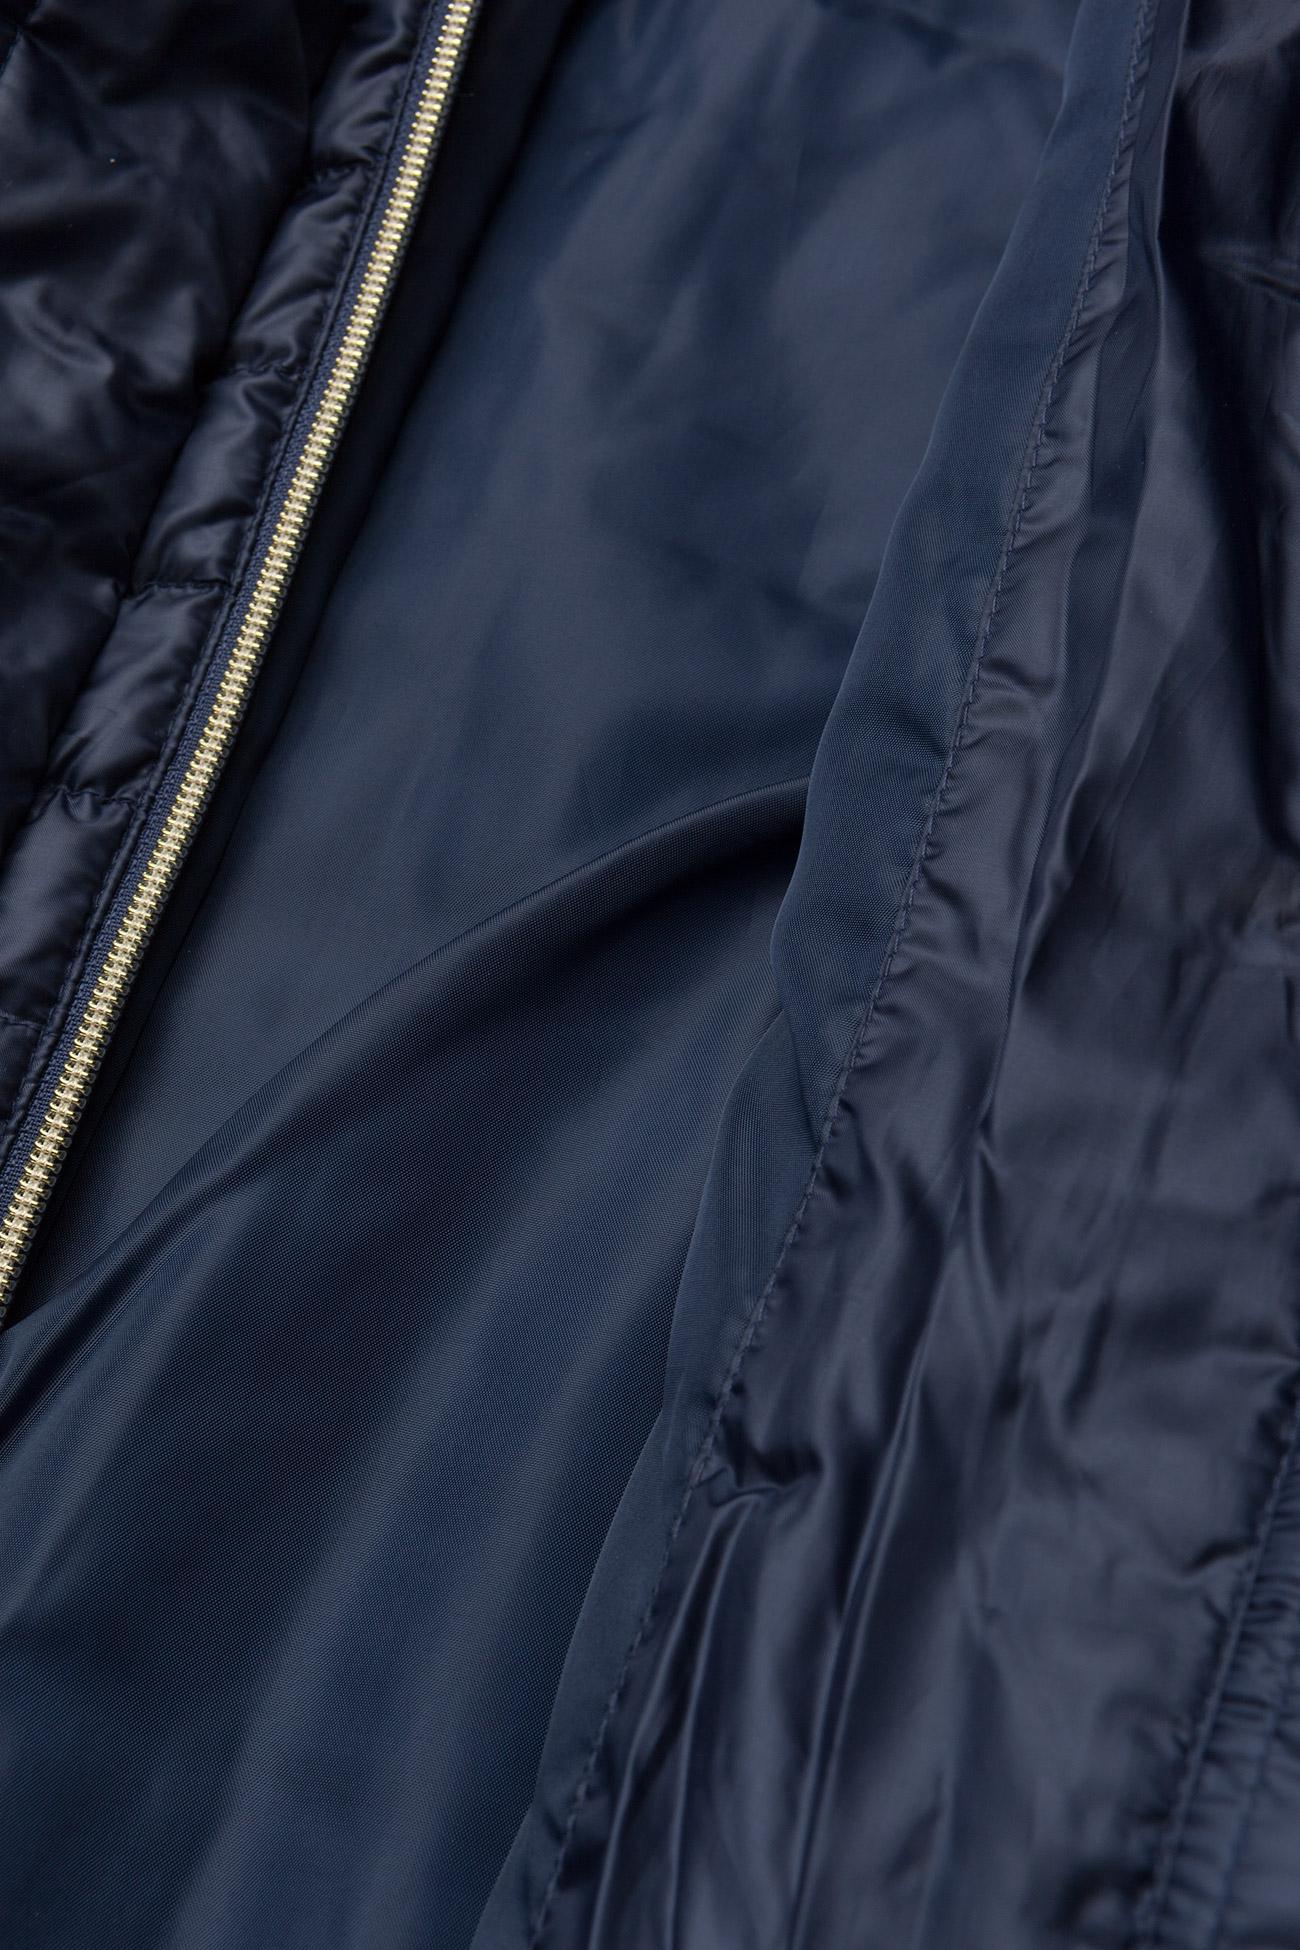 Michael Kors Belted Pckbl Puffr - Jackor & Kappor True Navy